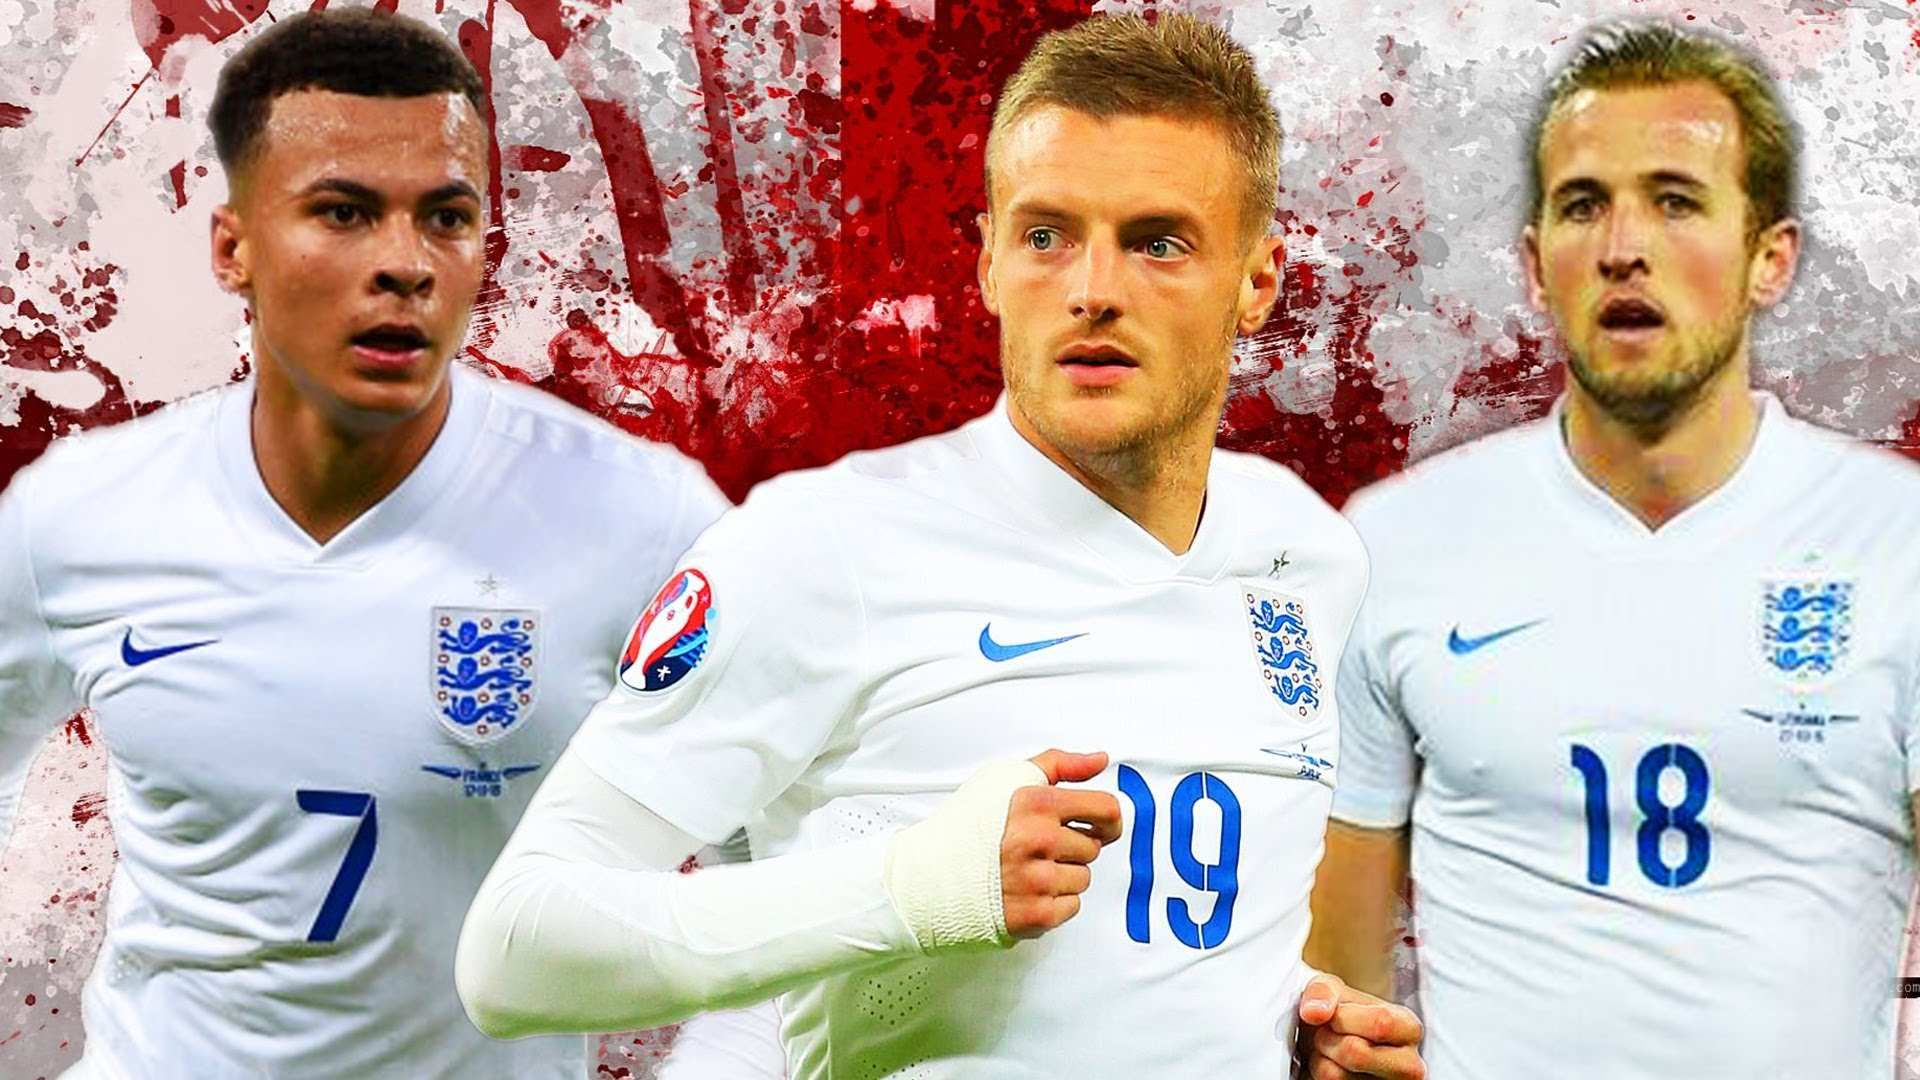 England 2018 FWC HD Wallpaper